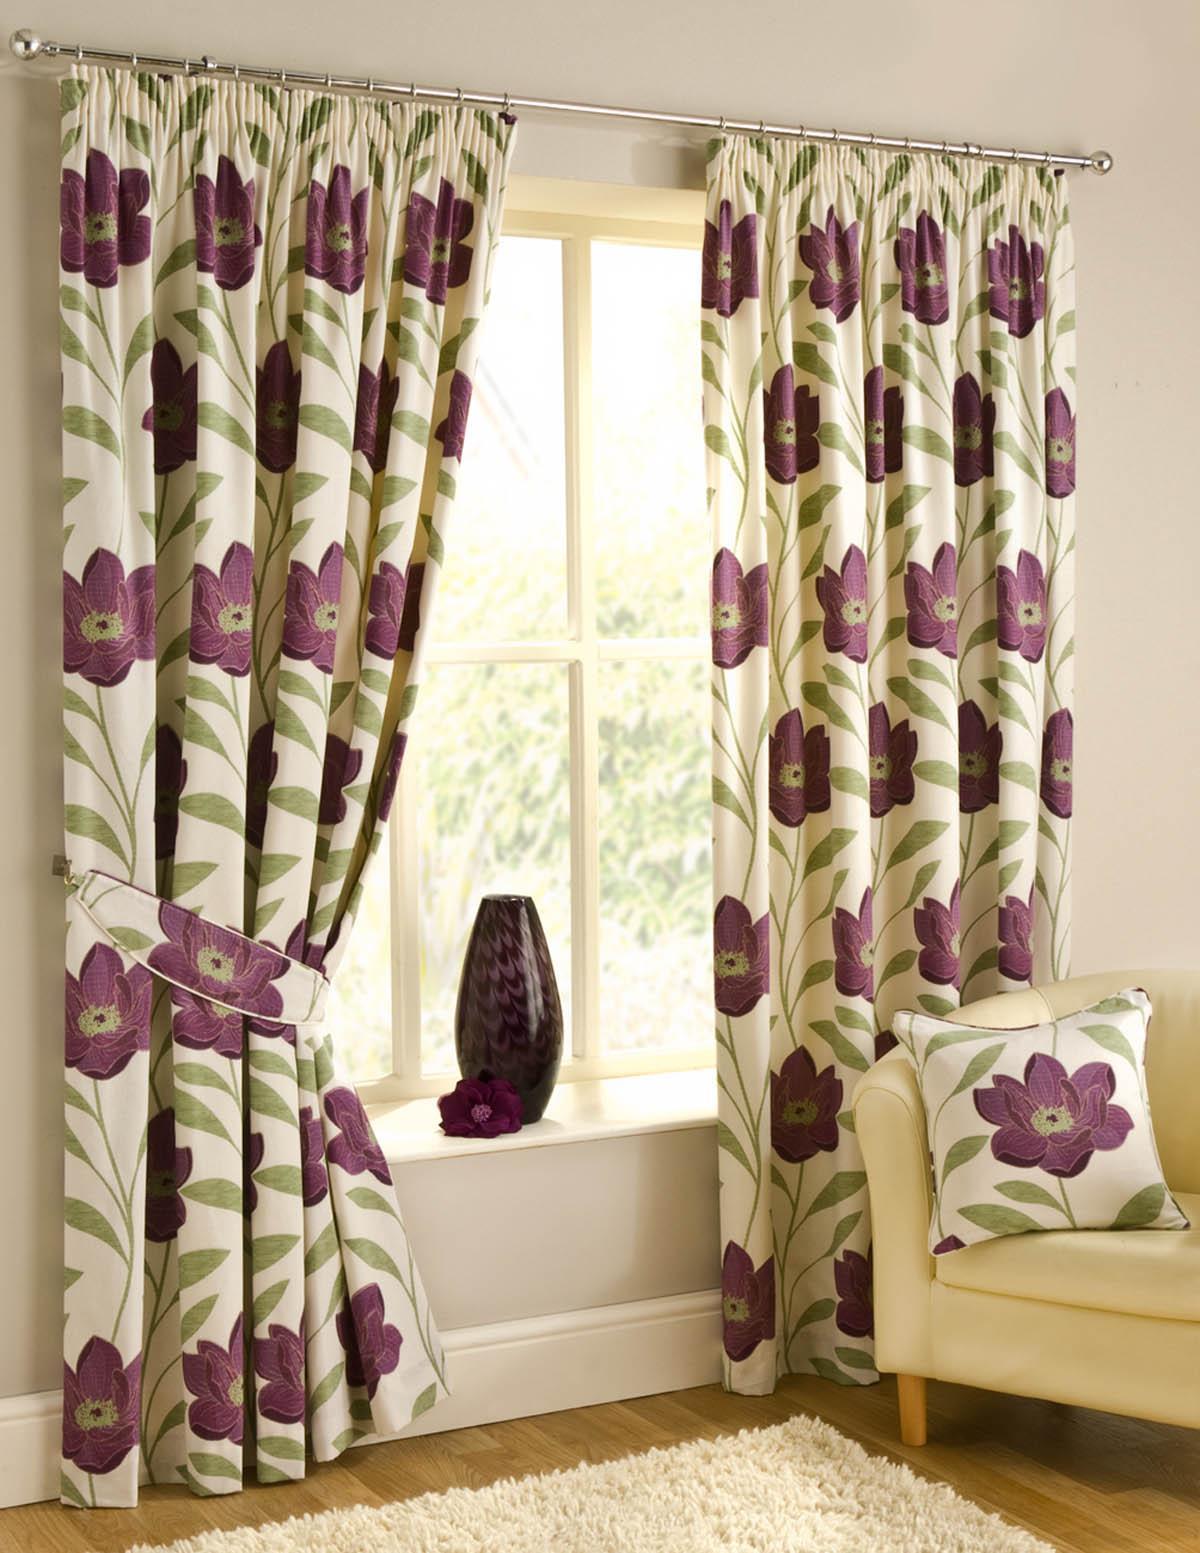 Plum curtains - Download